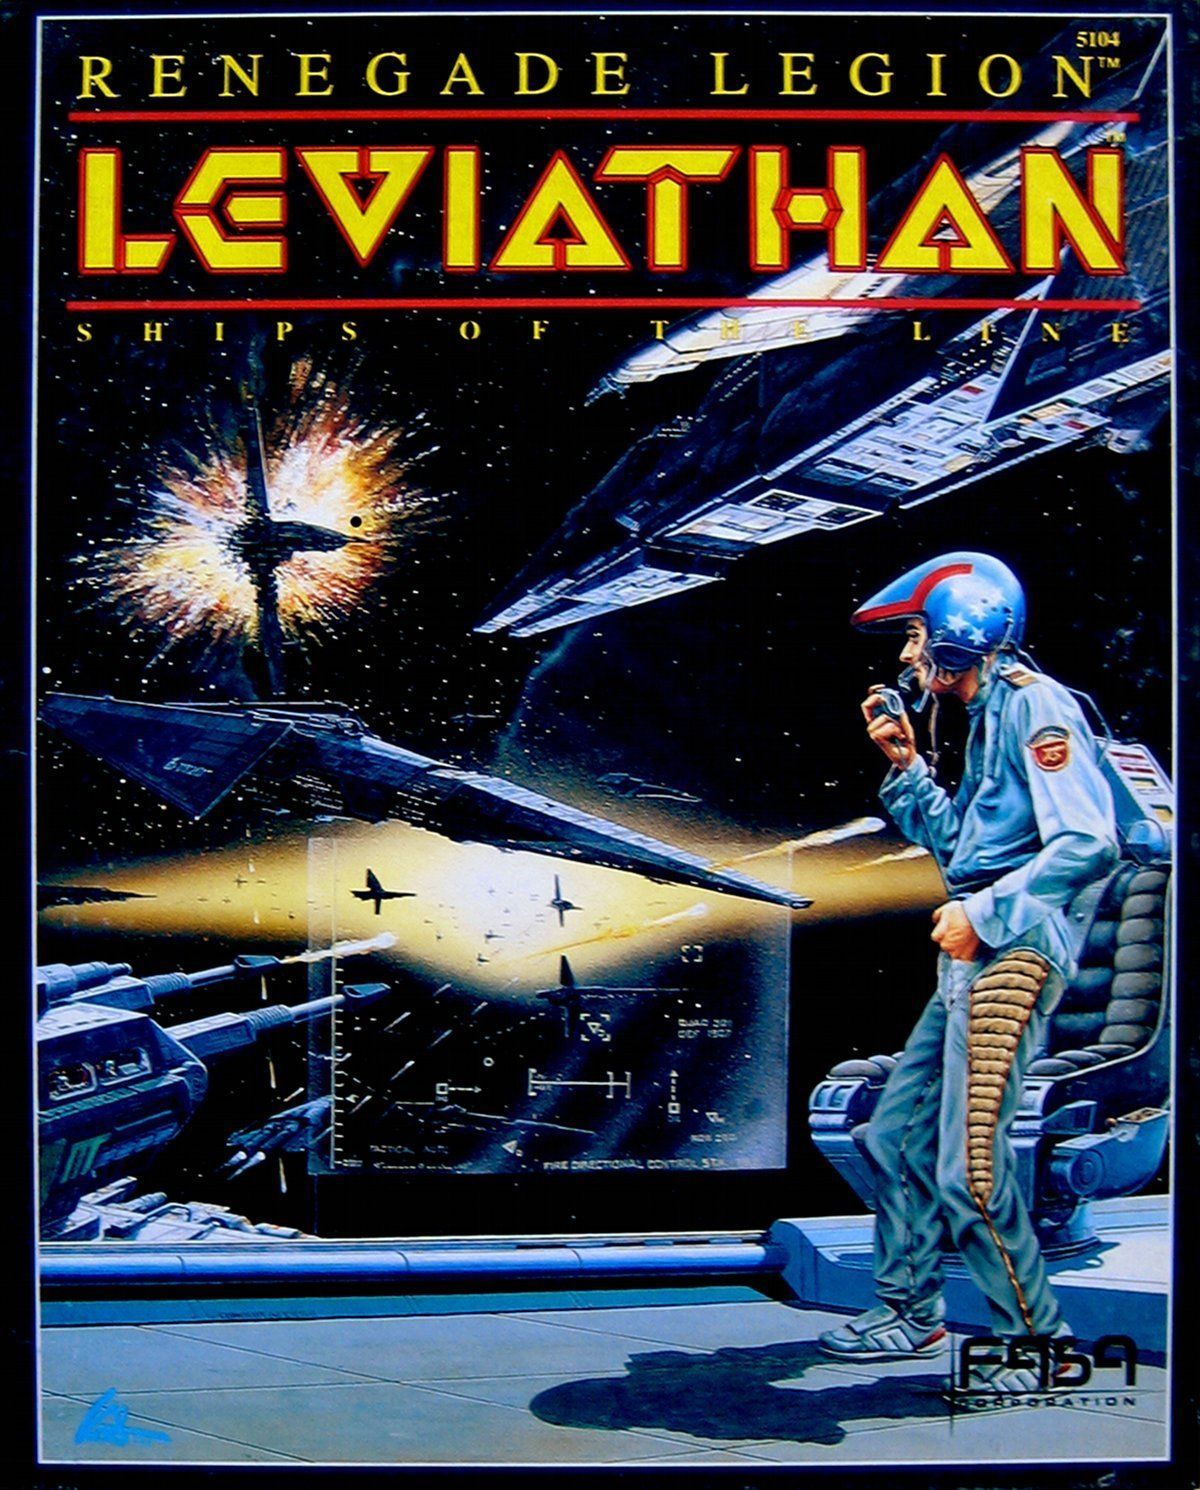 Renegade Legion: Leviathan